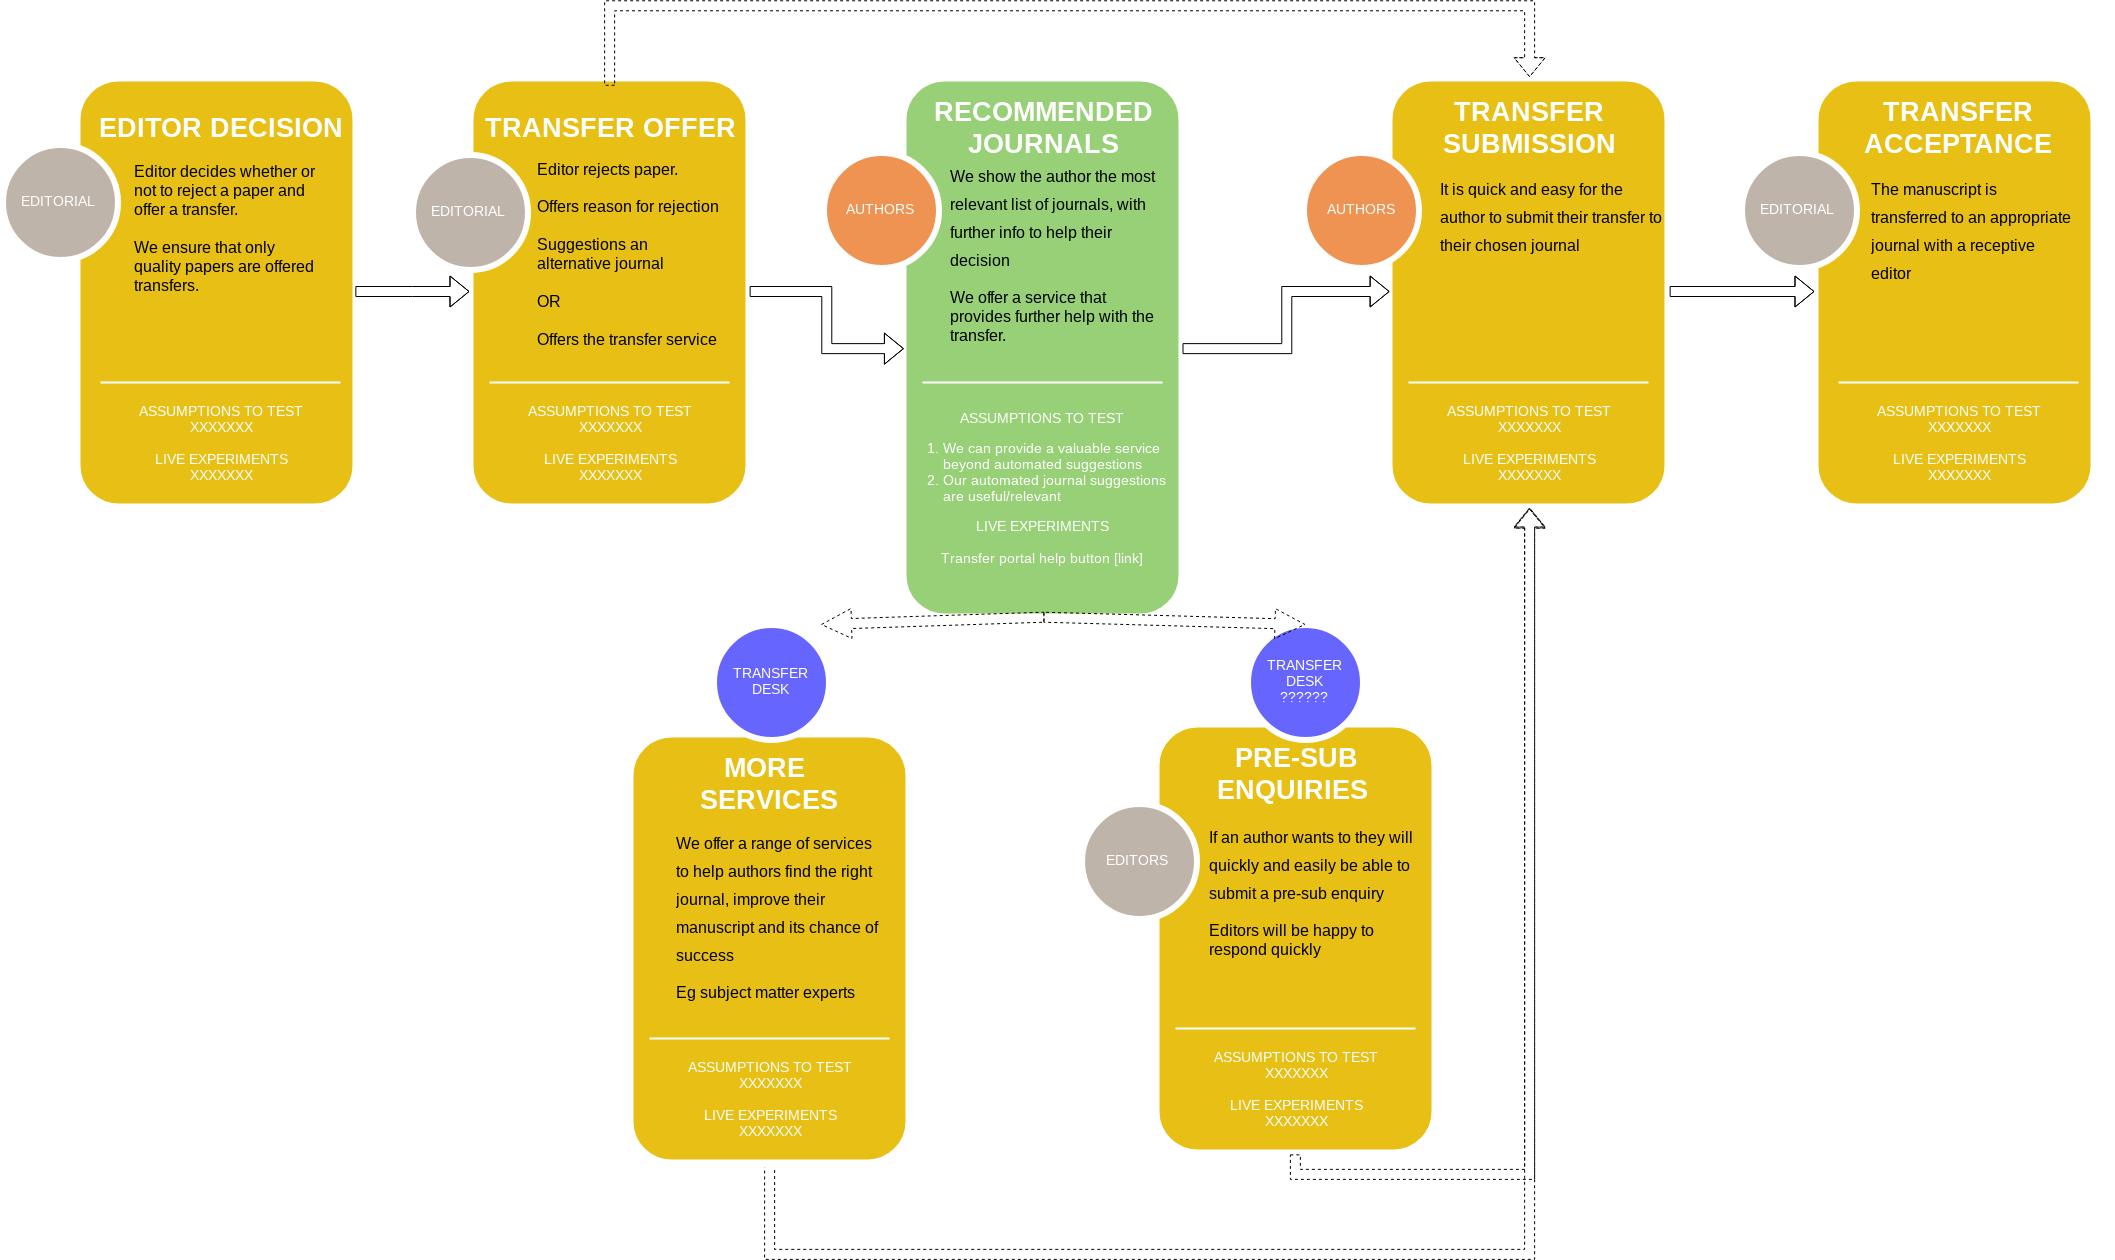 Springer Nature's Manuscript Transfers Service - Andrea